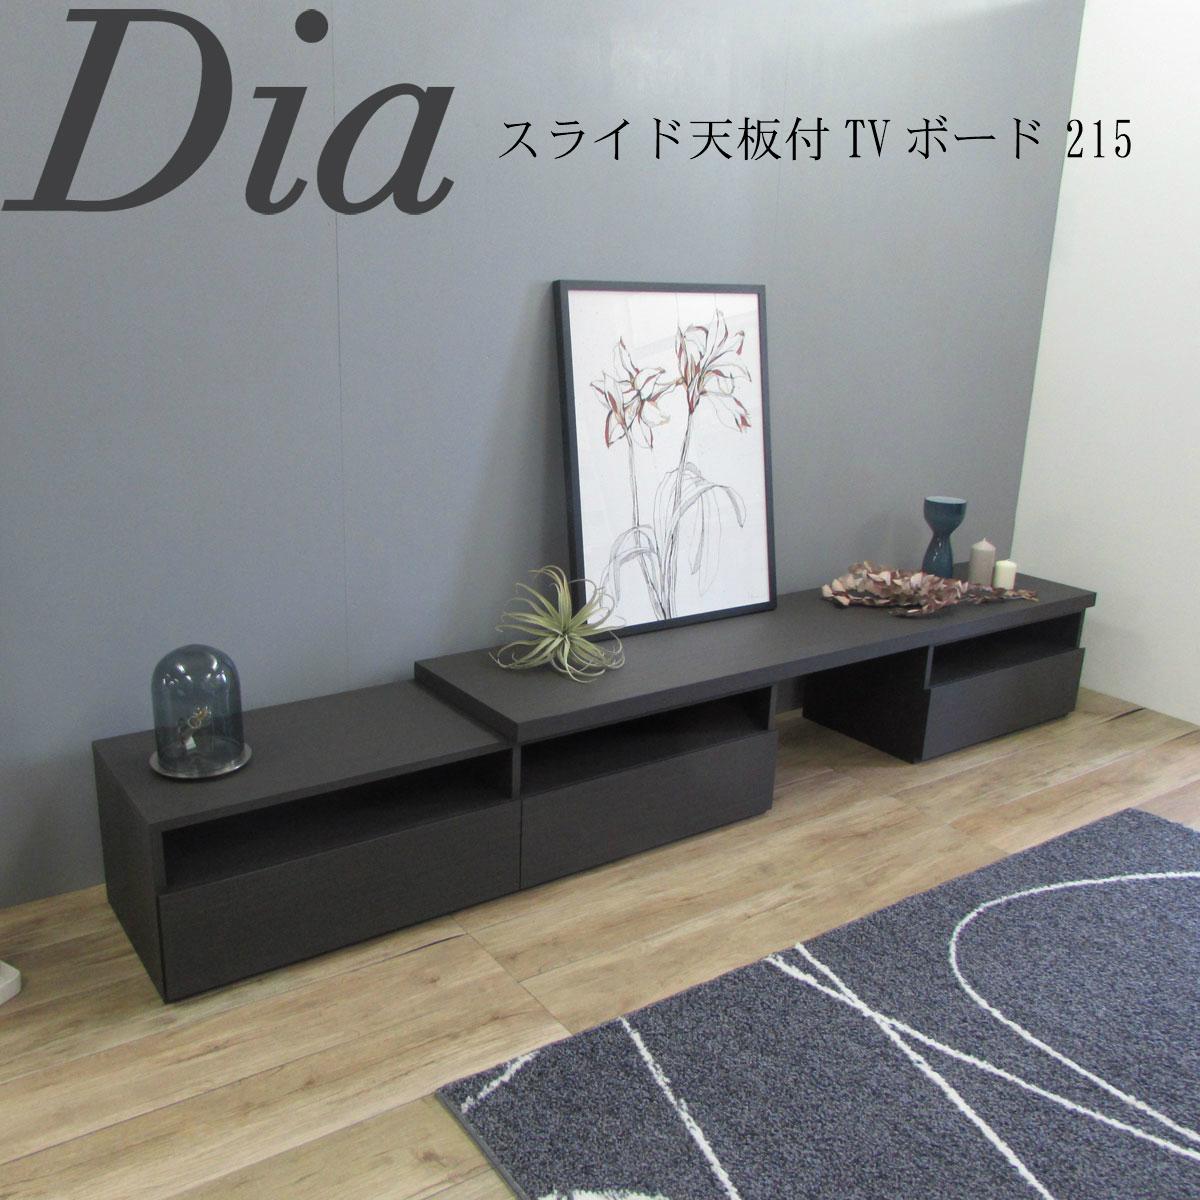 Dia ディア スライド天板付 TVボード 215【一部地域開梱設置無料】【代引き不可】